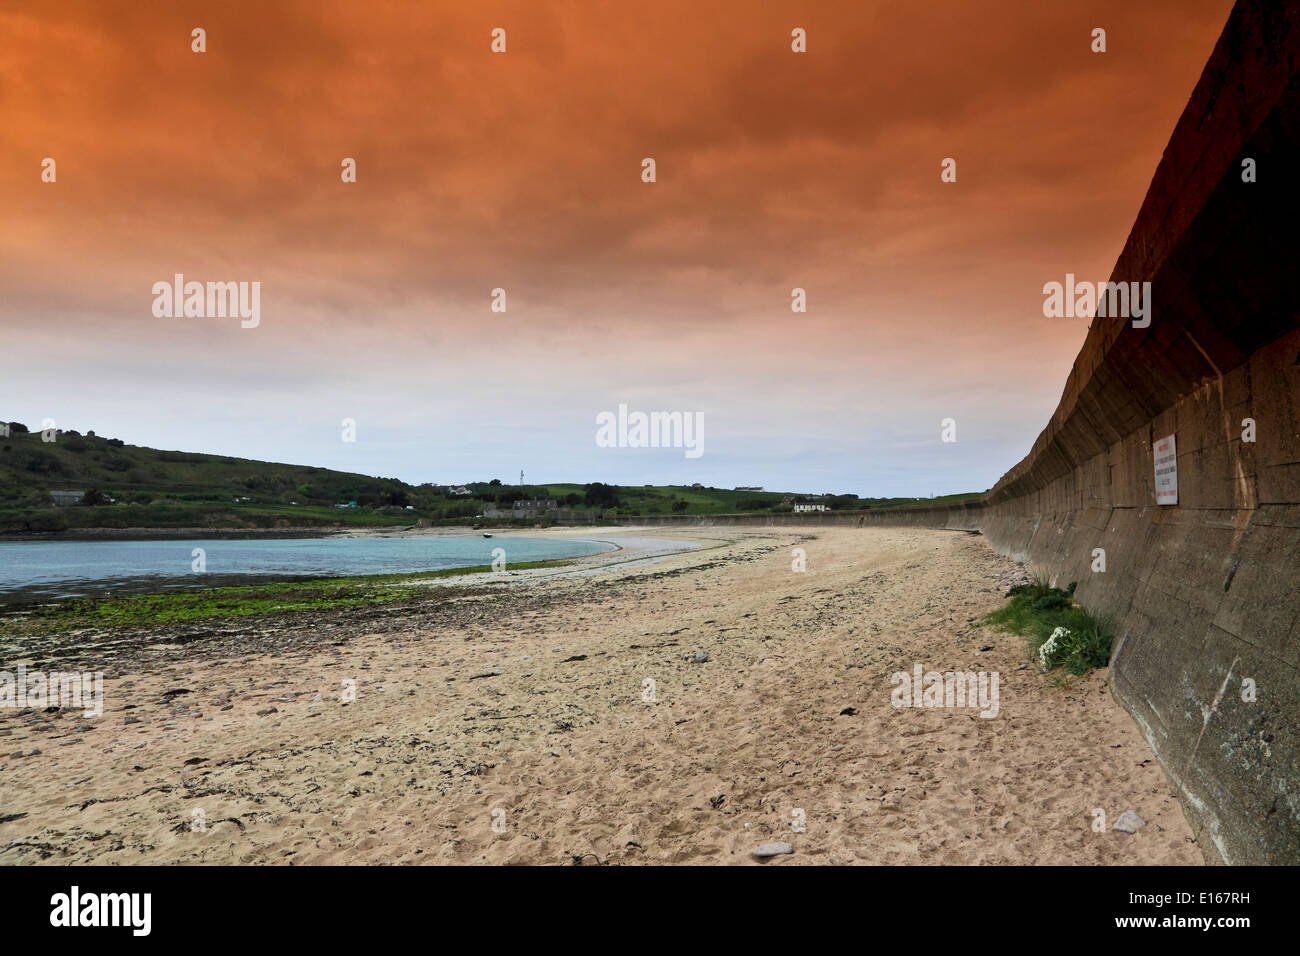 9119. German anit-tank defenses WW2, Longis Bay, Alderney, Channel Islands, UK, Europe - Stock Image